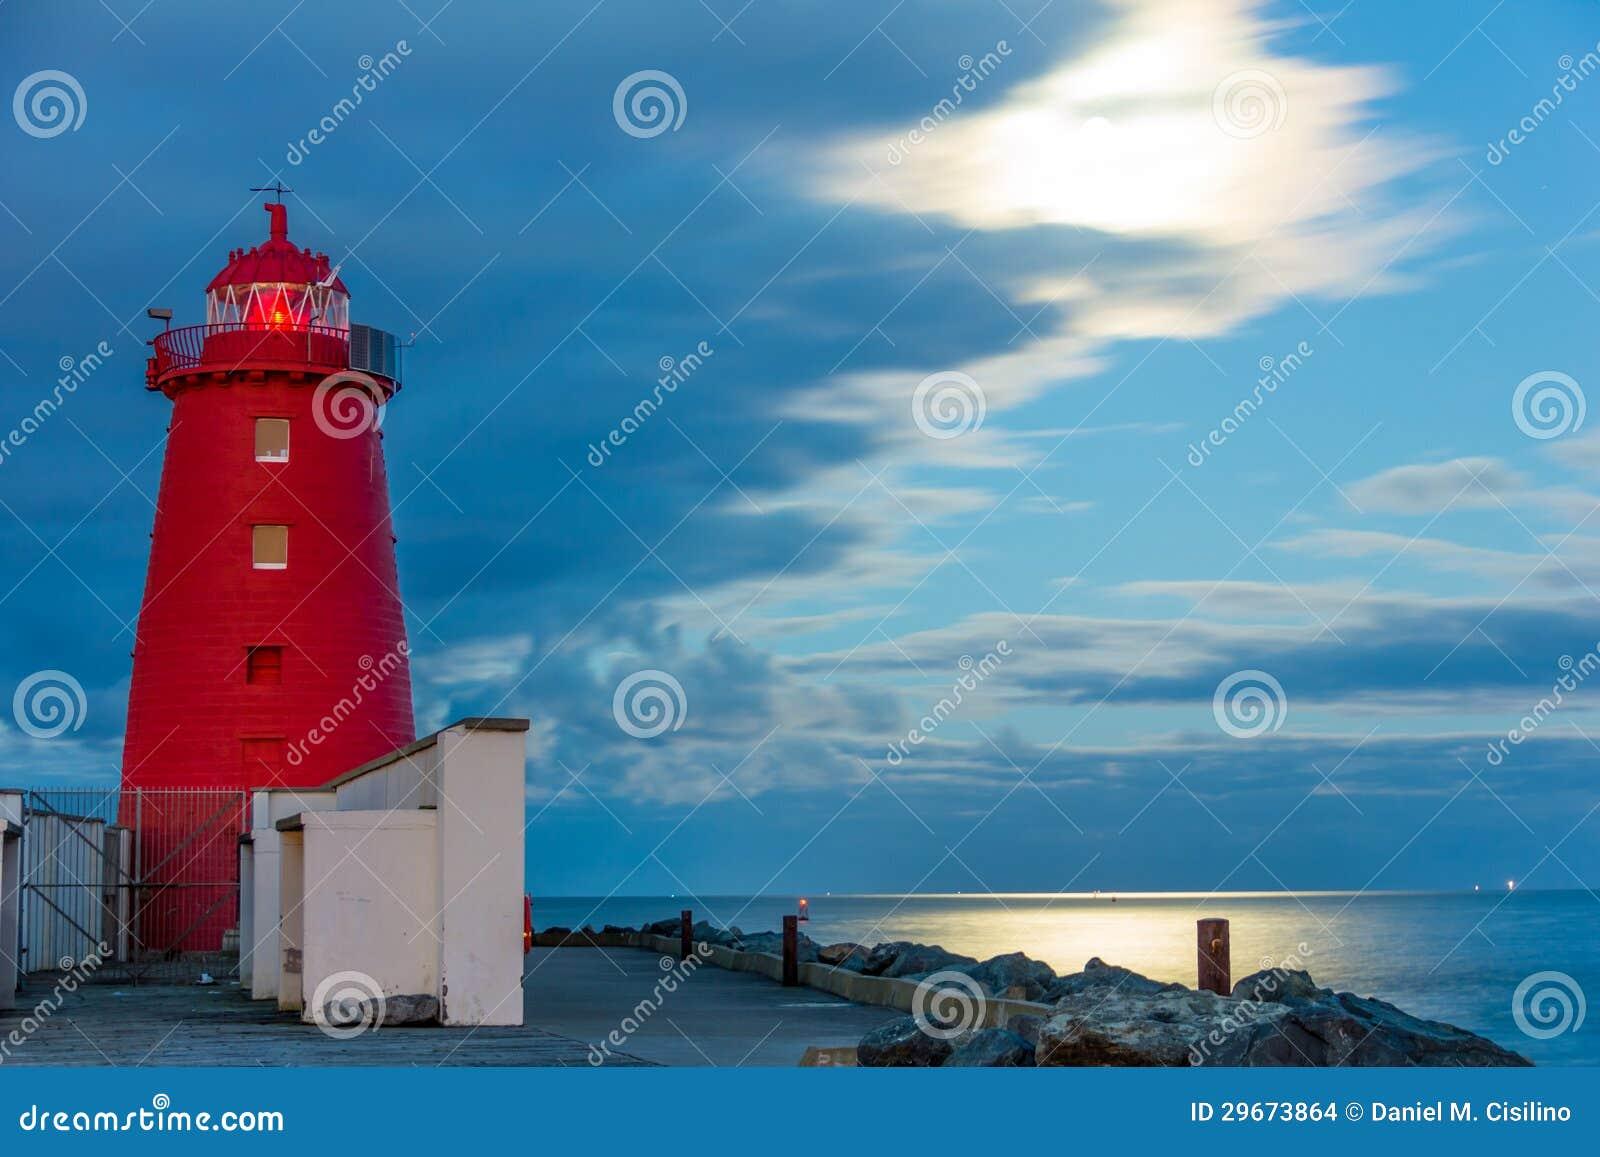 Poolbeg lighthouse at night. Dublin. Ireland